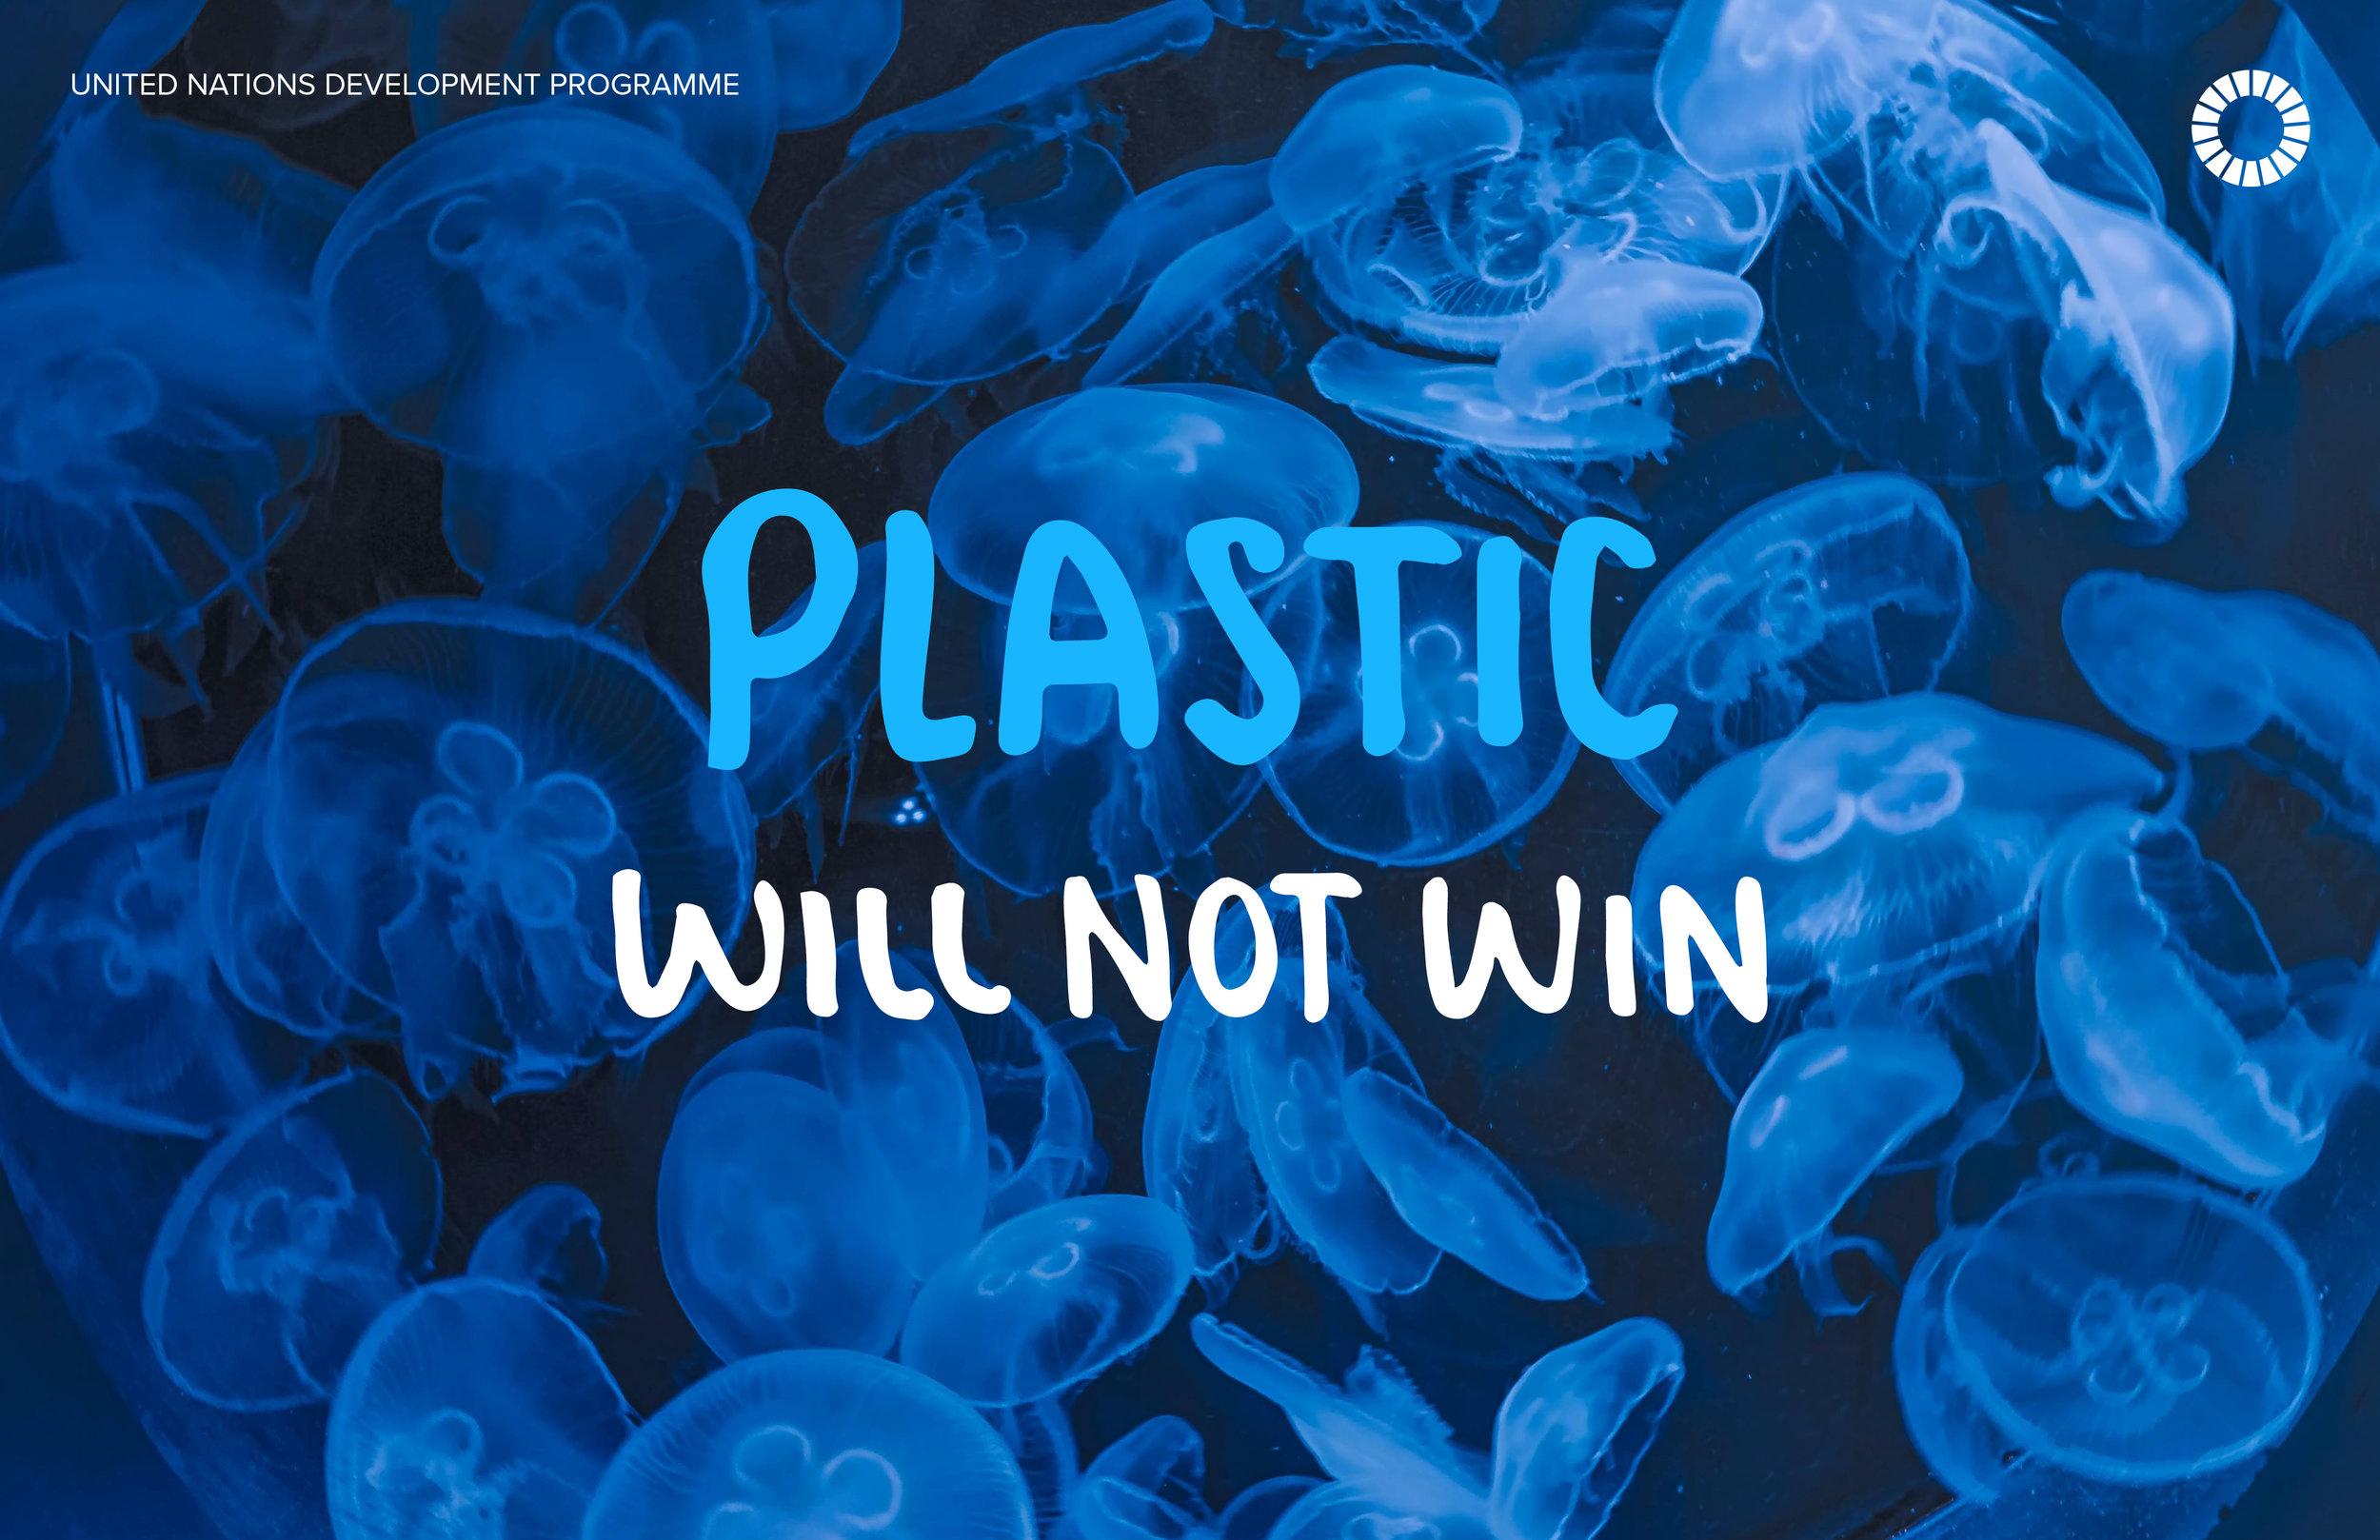 1. Plastic.jpg